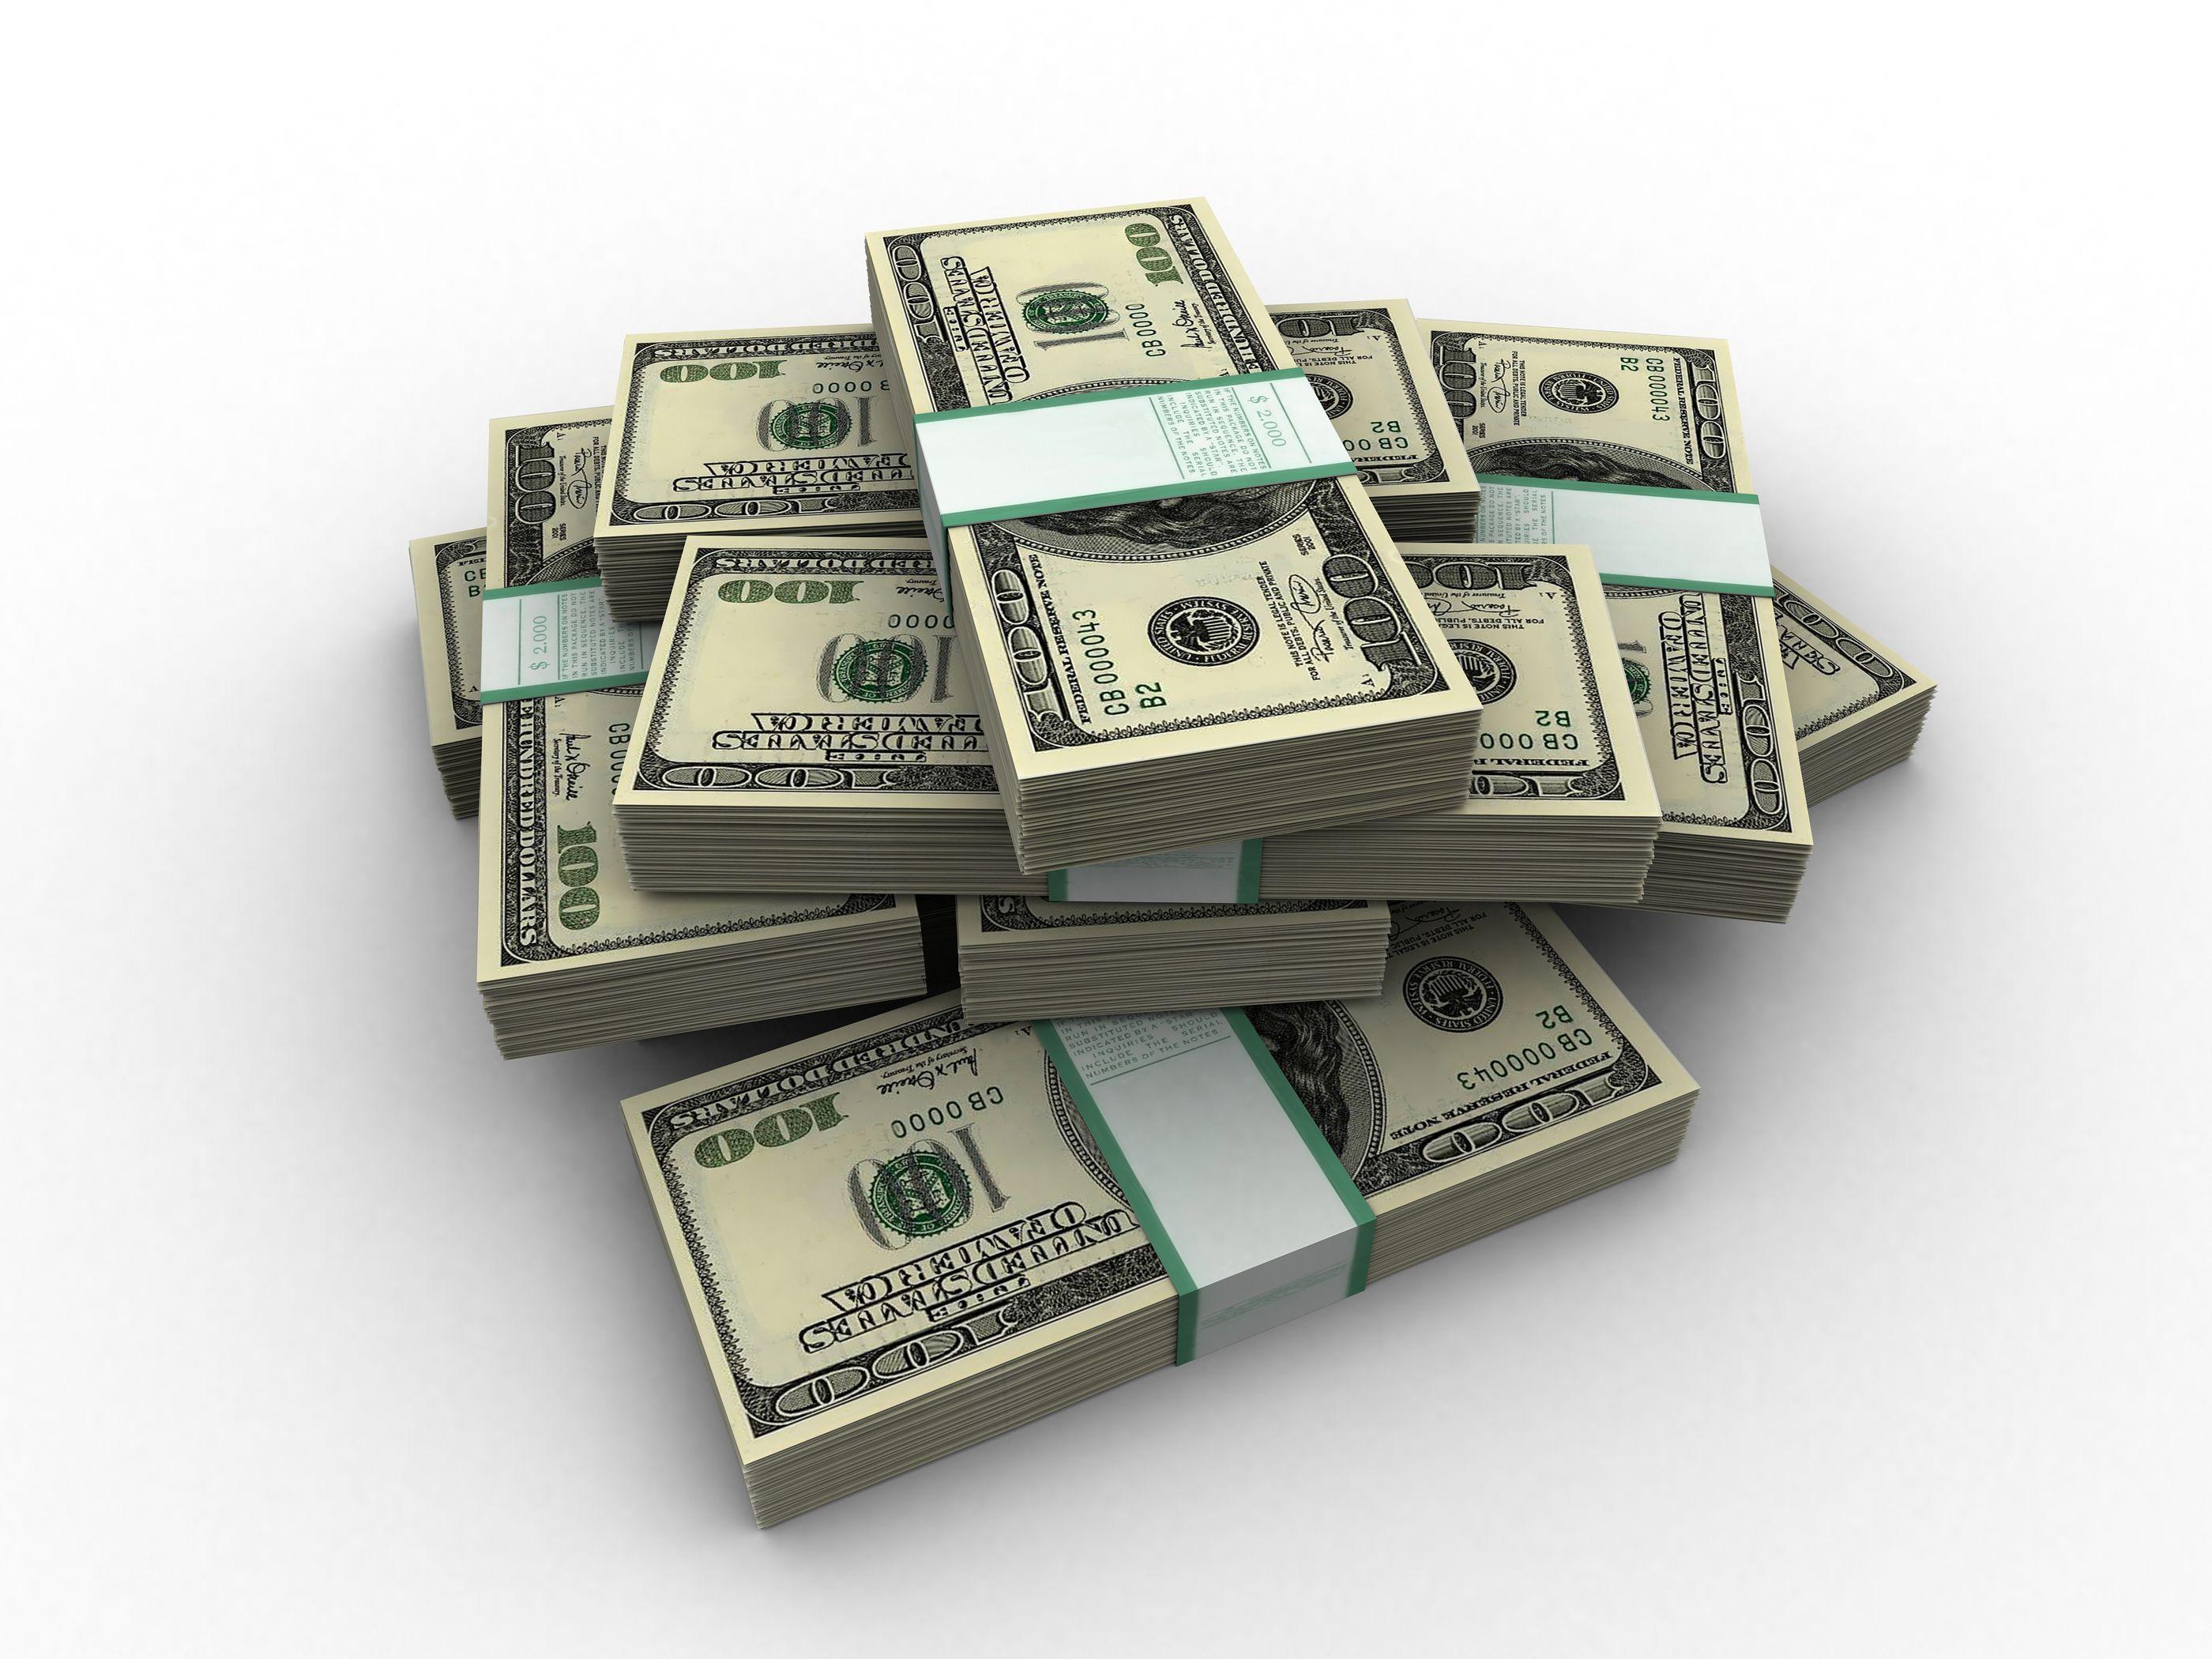 Bofa cash advance image 8